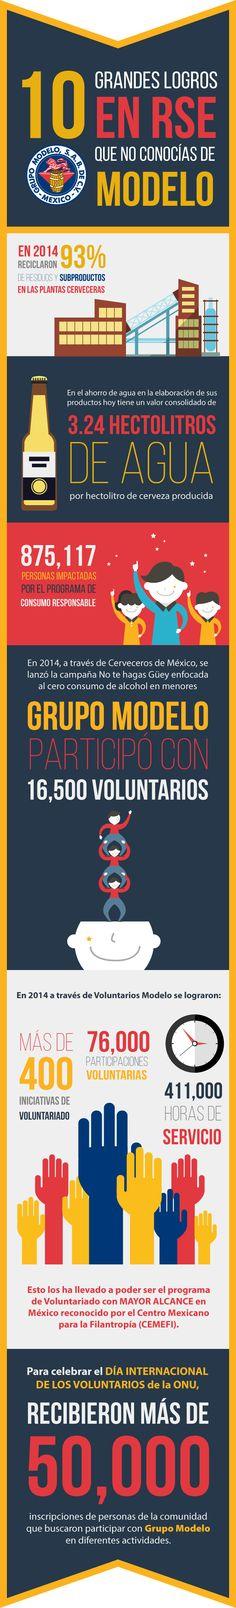 Entérate de los principales logros que tuvo Fundación Grupo Modelo en 2014 a través de la siguiente infografía. http://www.expoknews.com/10-grandes-logros-en-rse-que-no-conocias-de-modelo/